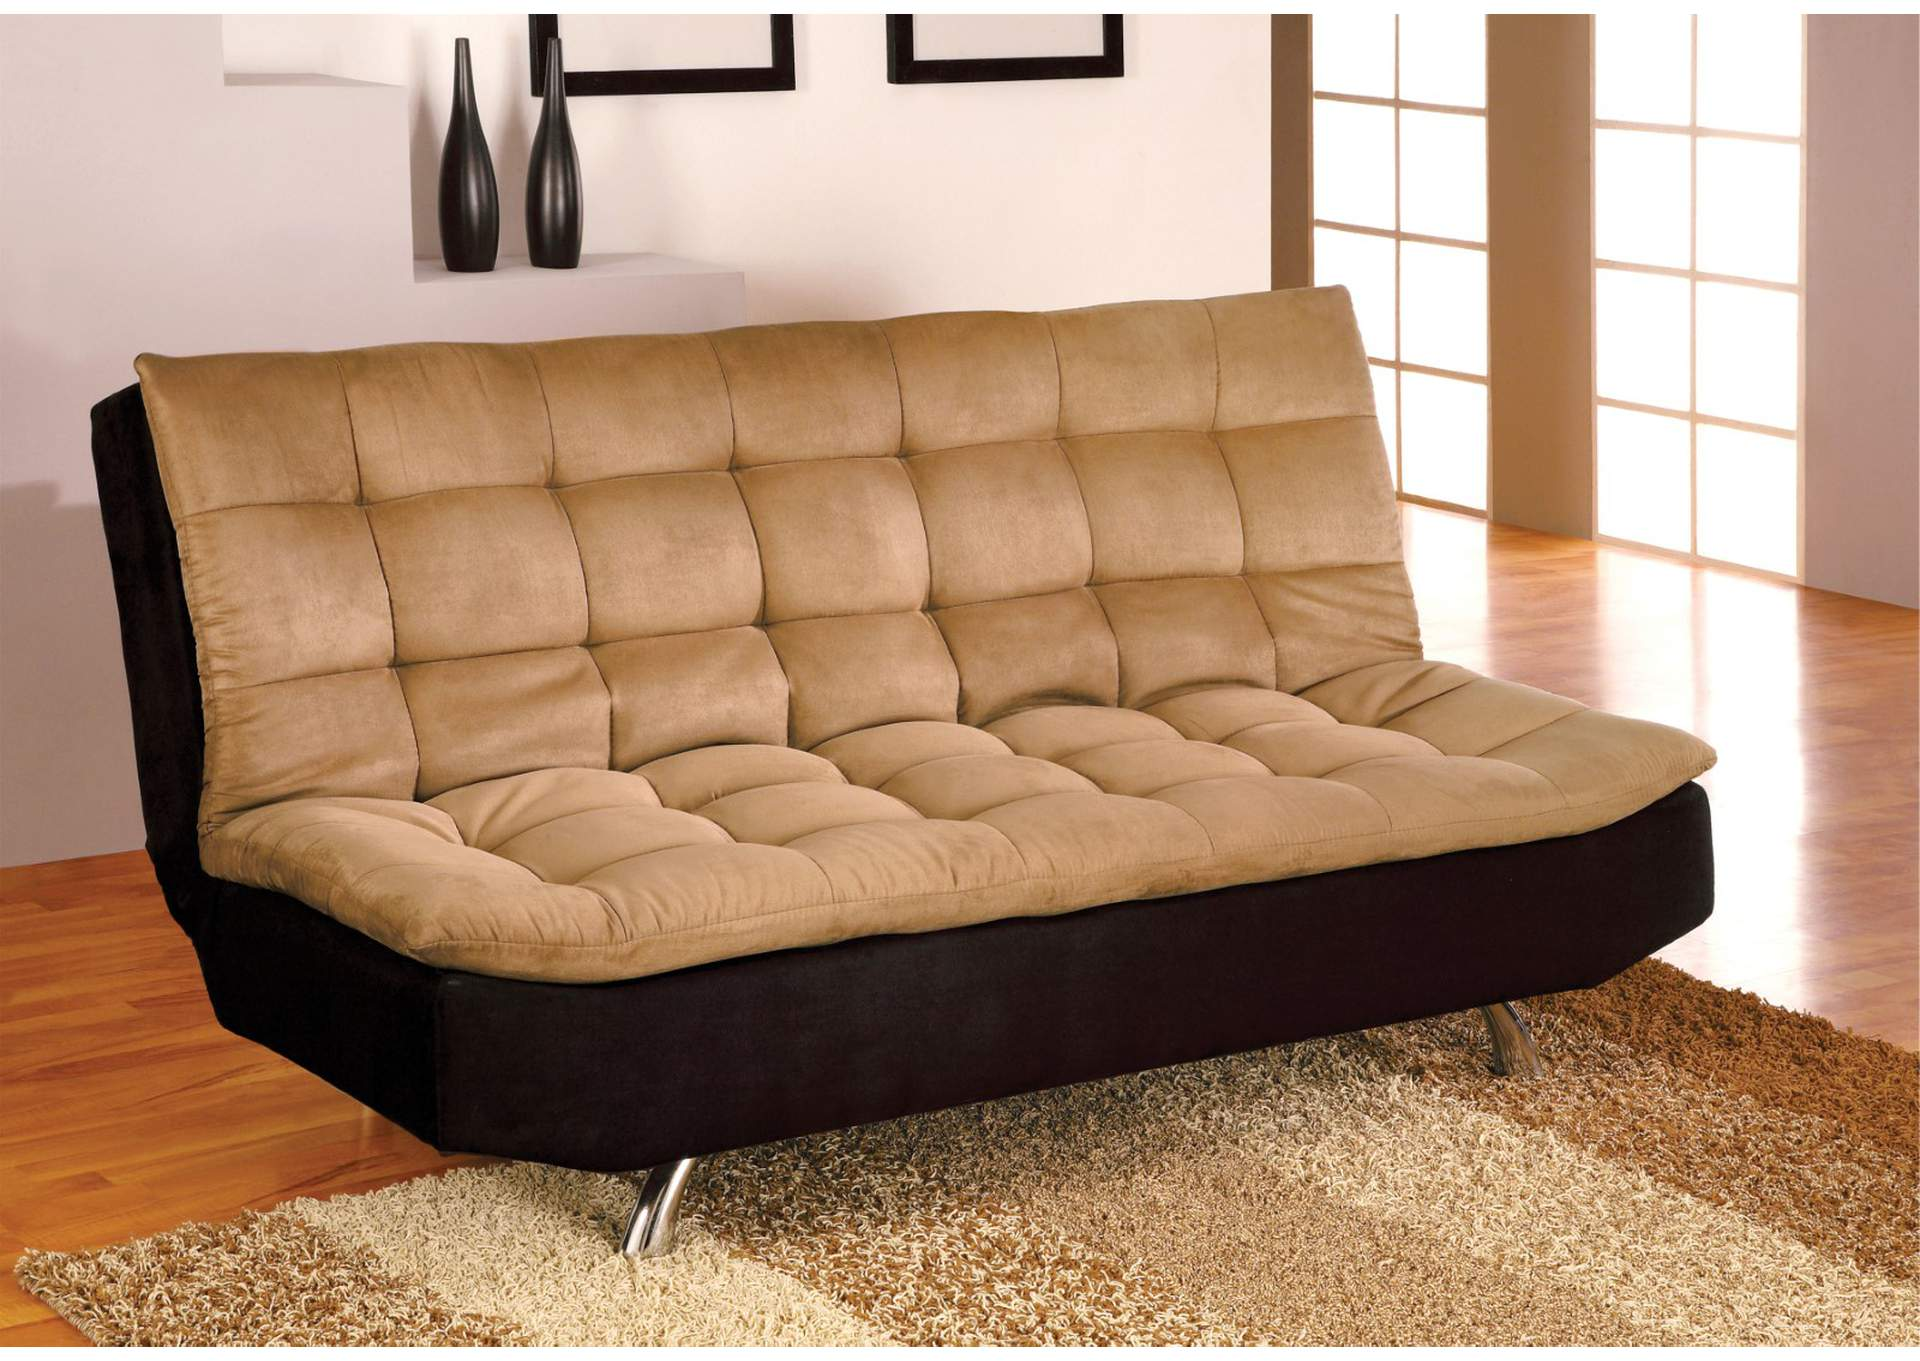 Long island discount furniture mancora tan black - Living room furniture long island ...